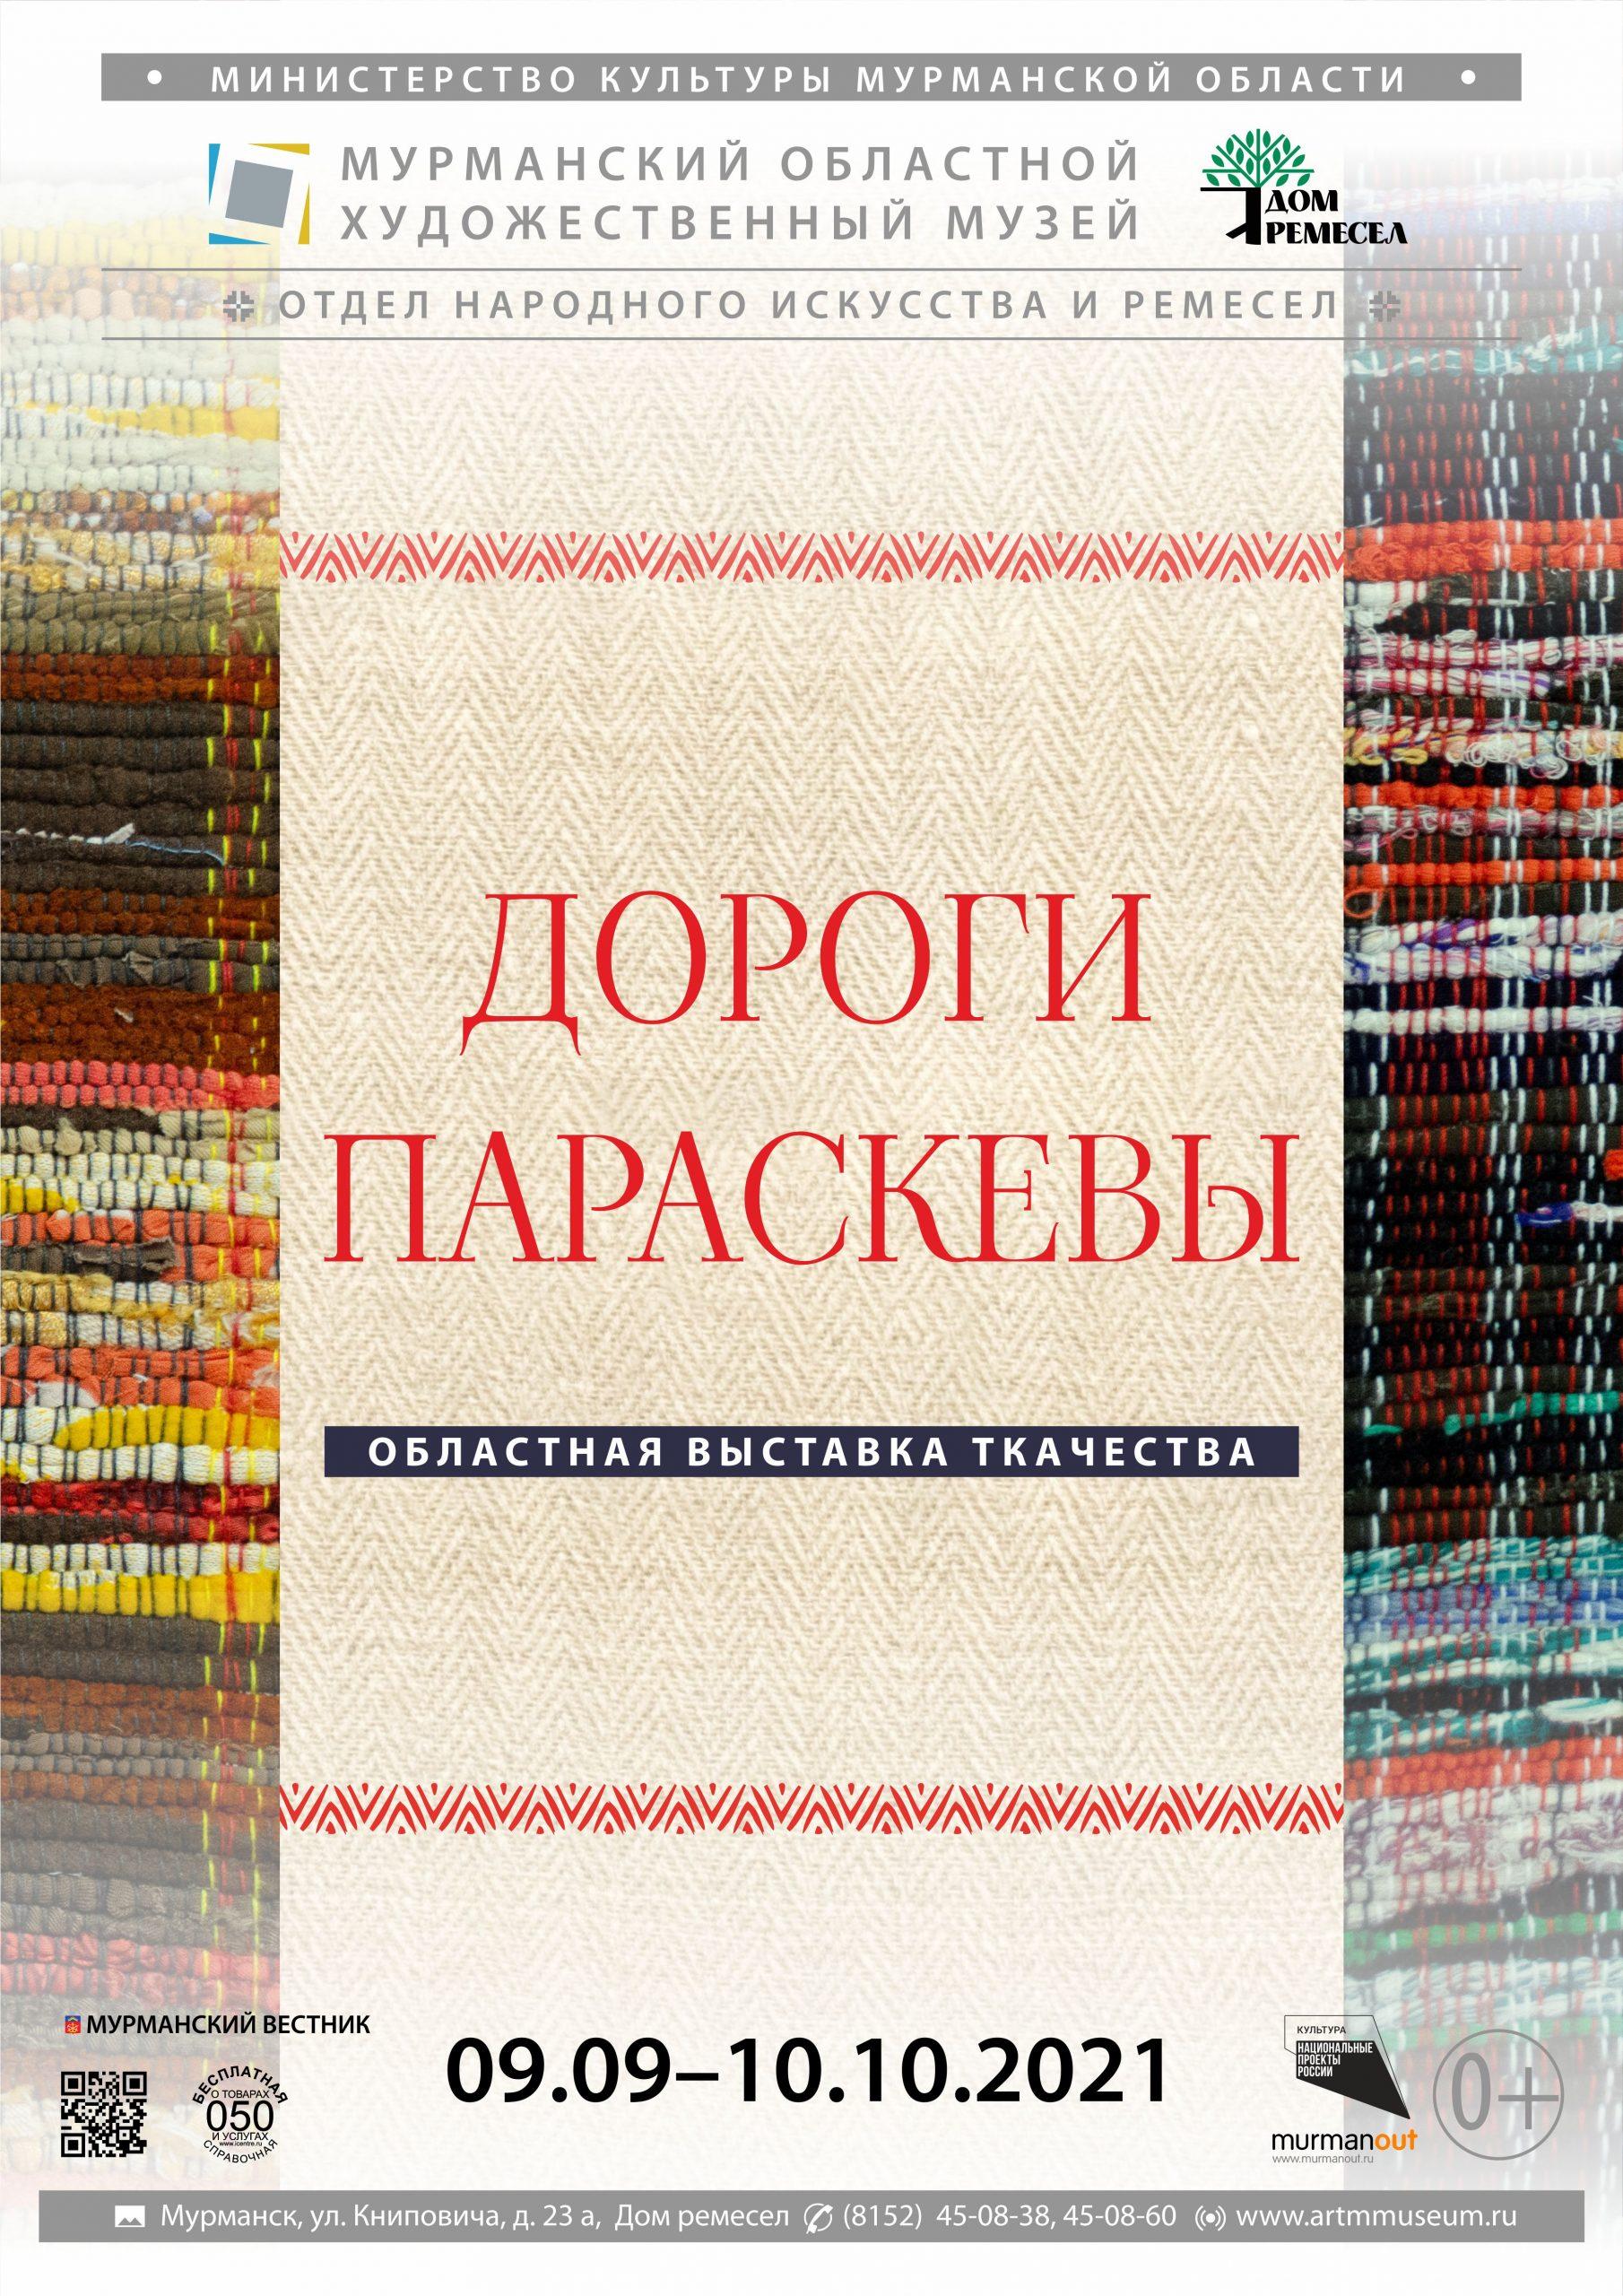 Областная выставка ткачества «Дороги Параскевы» 01.09 — 10.10.21